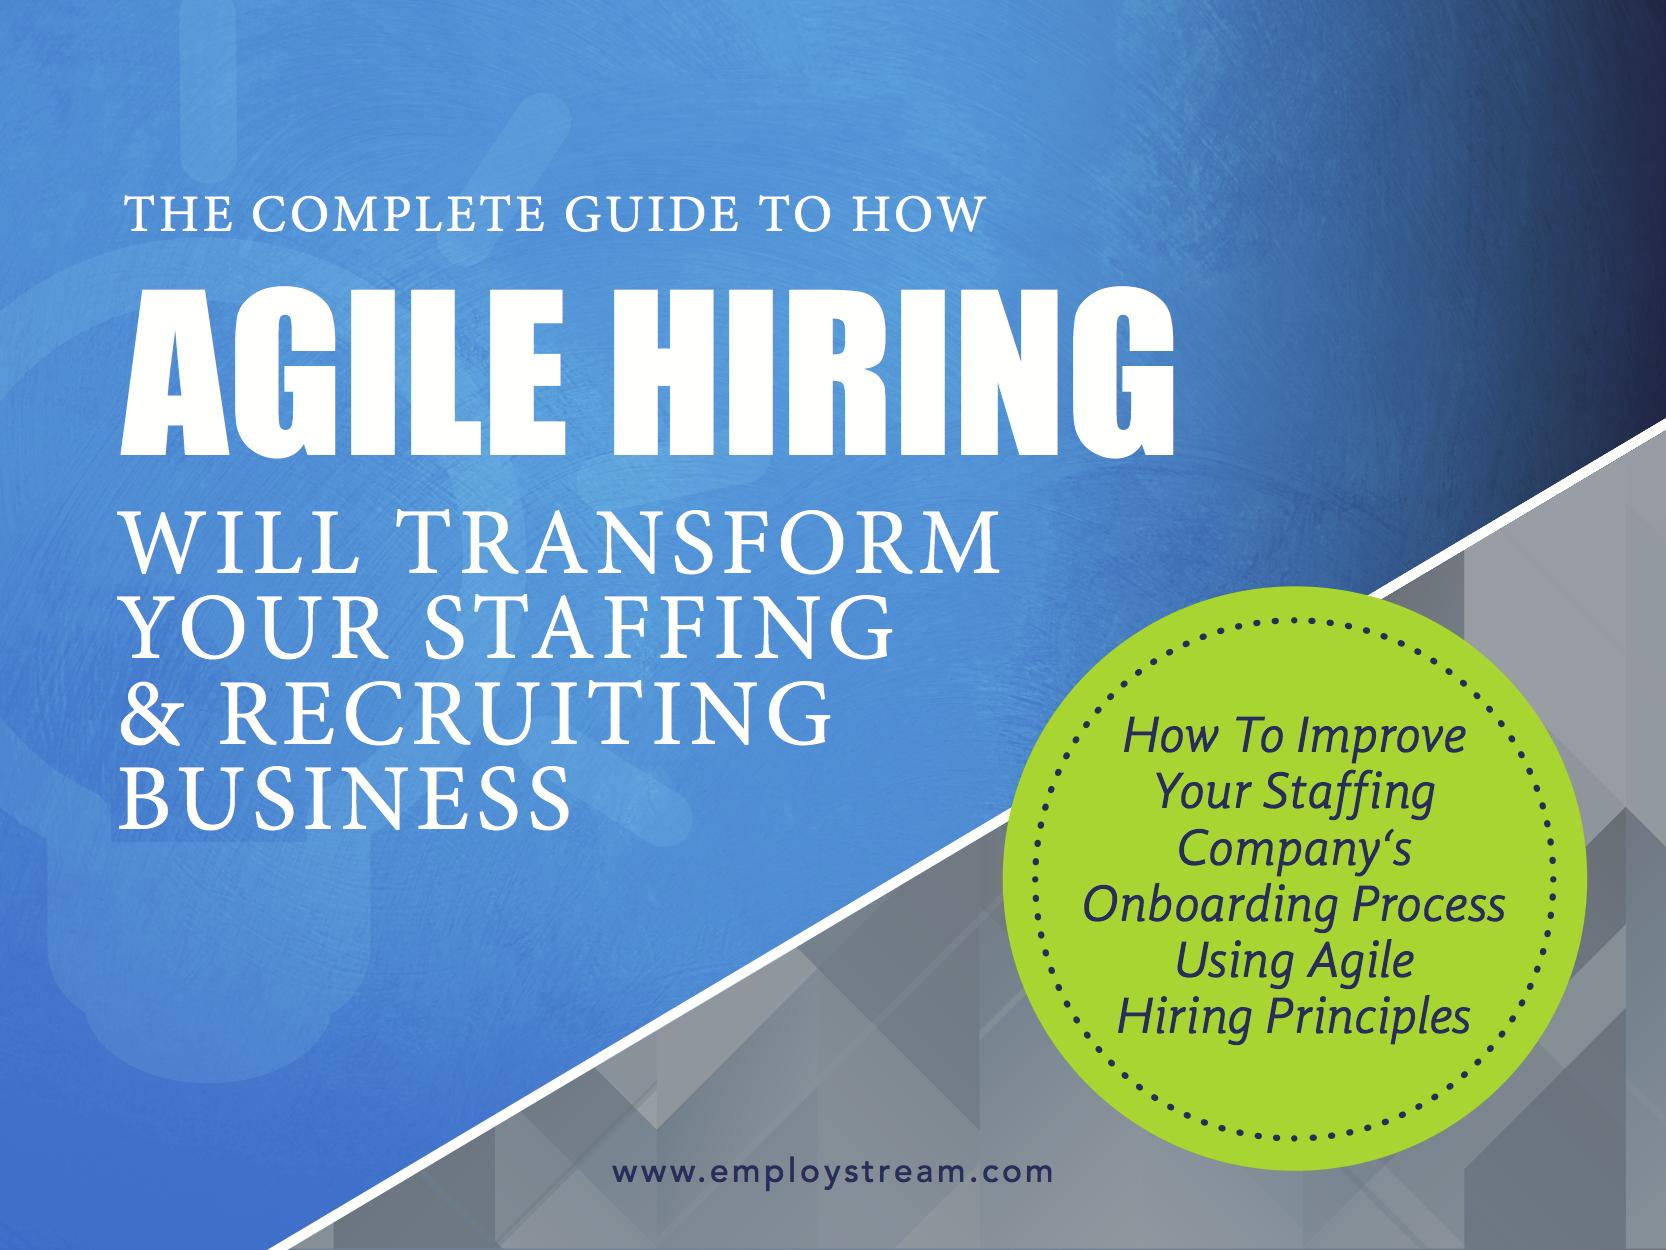 AgileHiring_EmployStream_FINAL.png